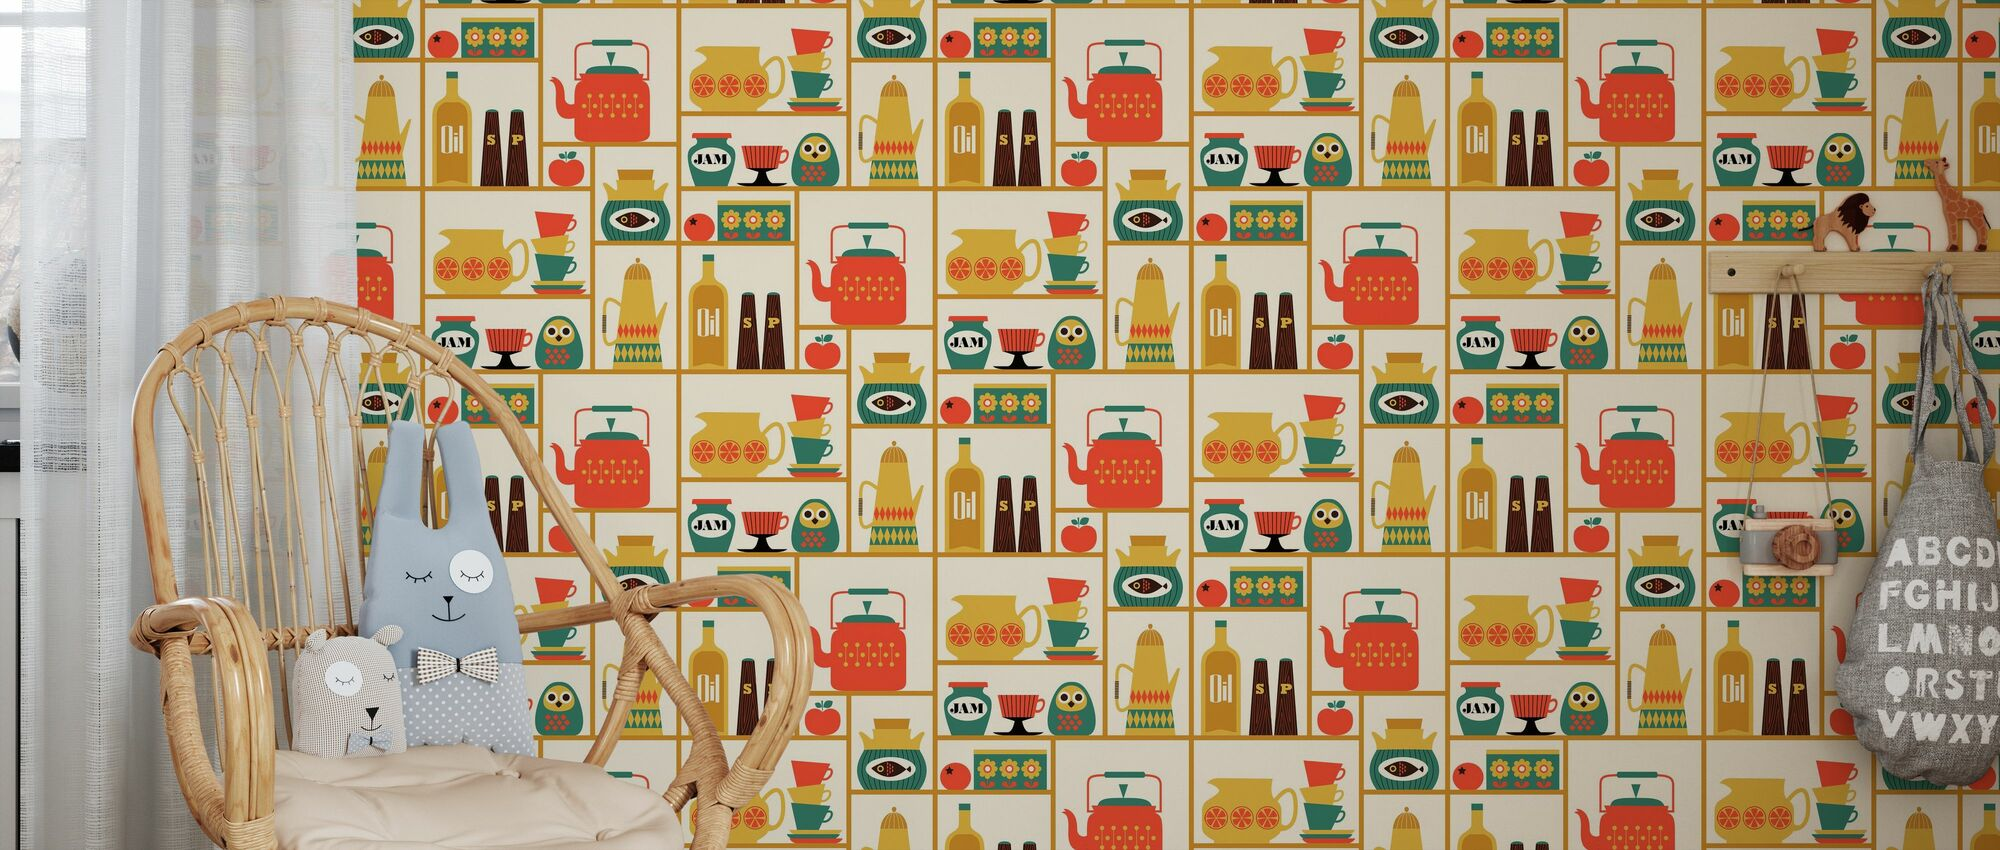 Kitchen Shelves - Yellow - Wallpaper - Kids Room